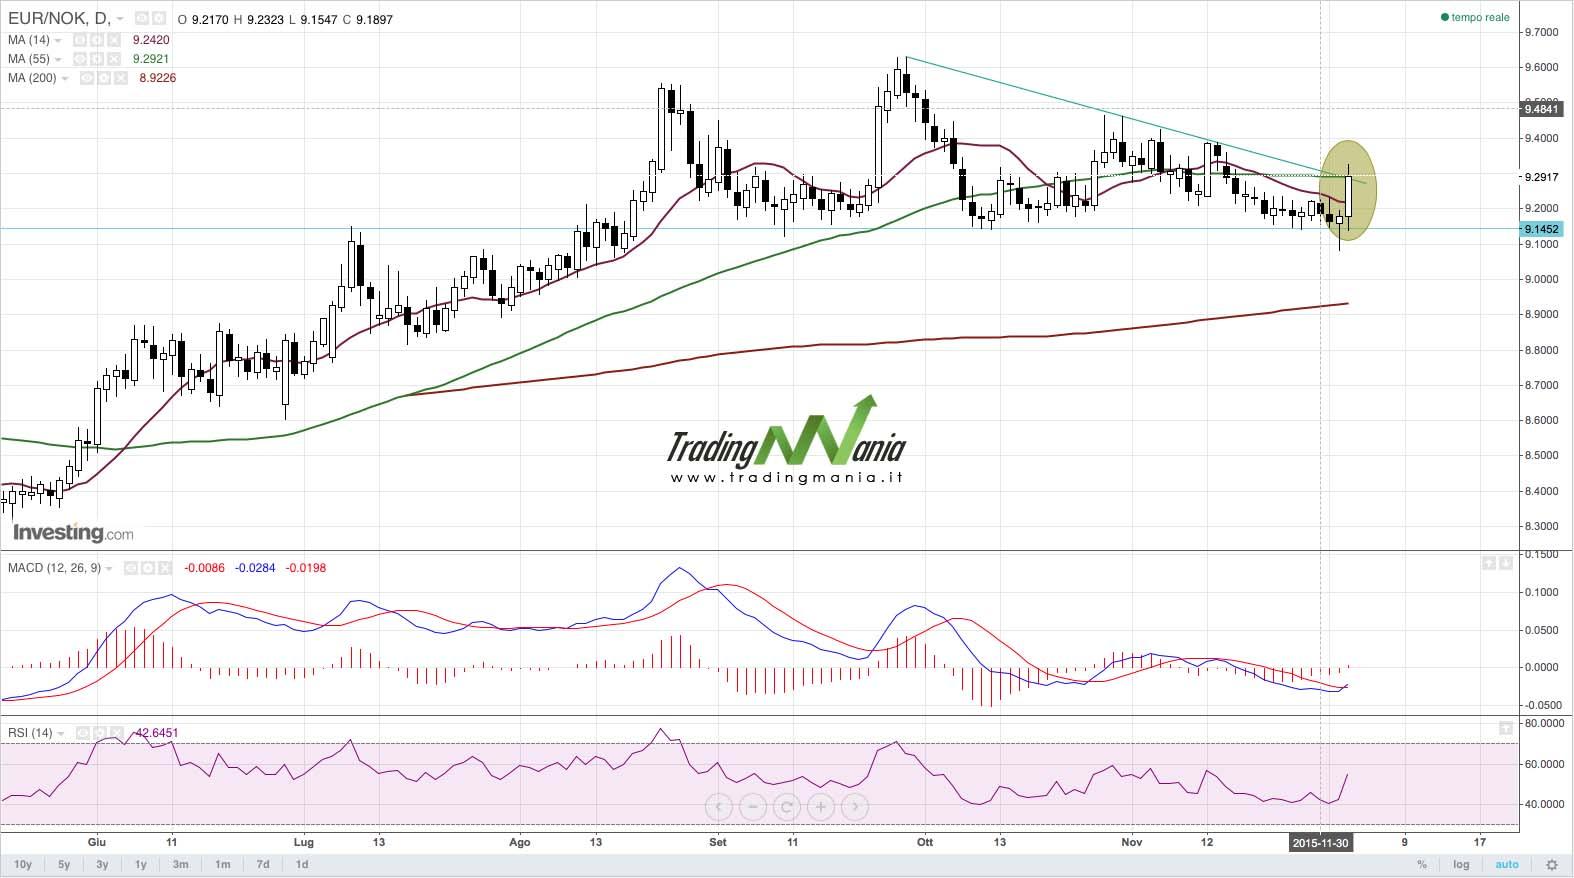 Strategia di trading online su EURNOK